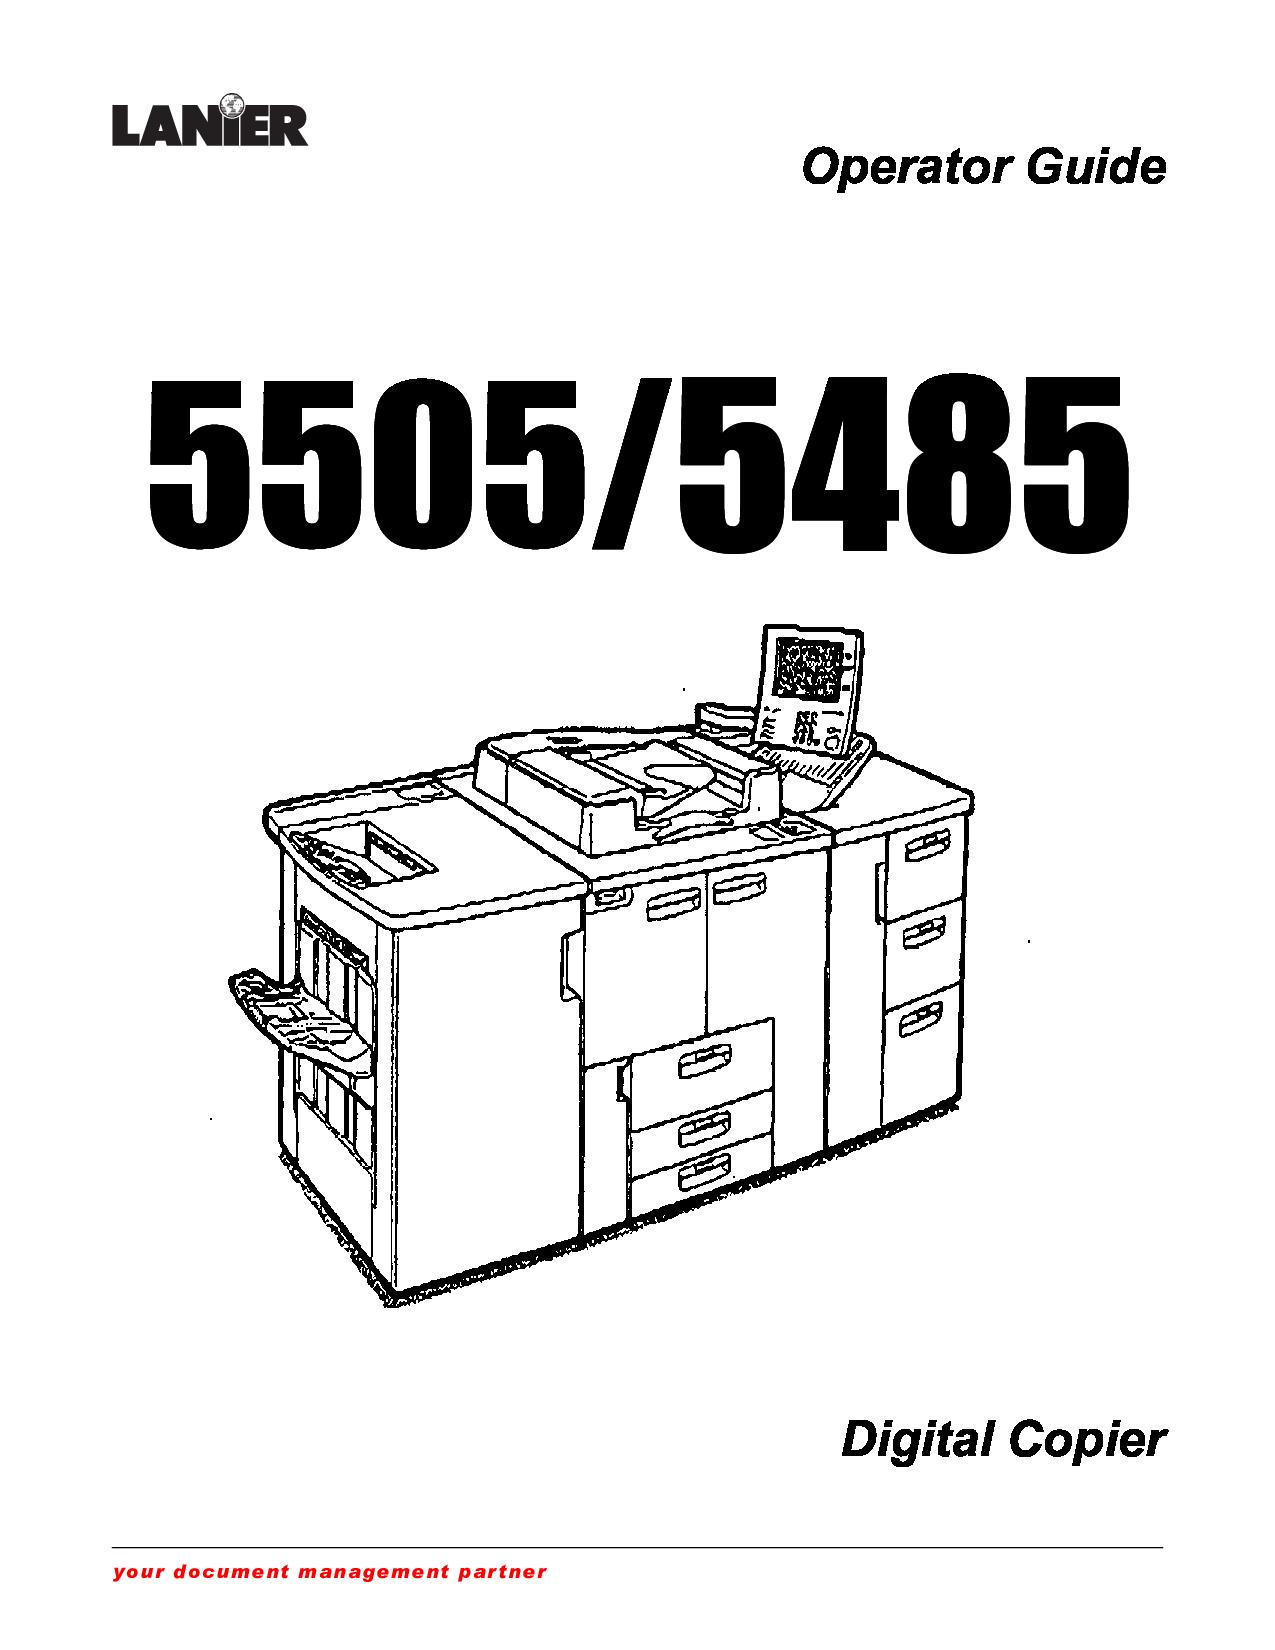 Lanier manuals